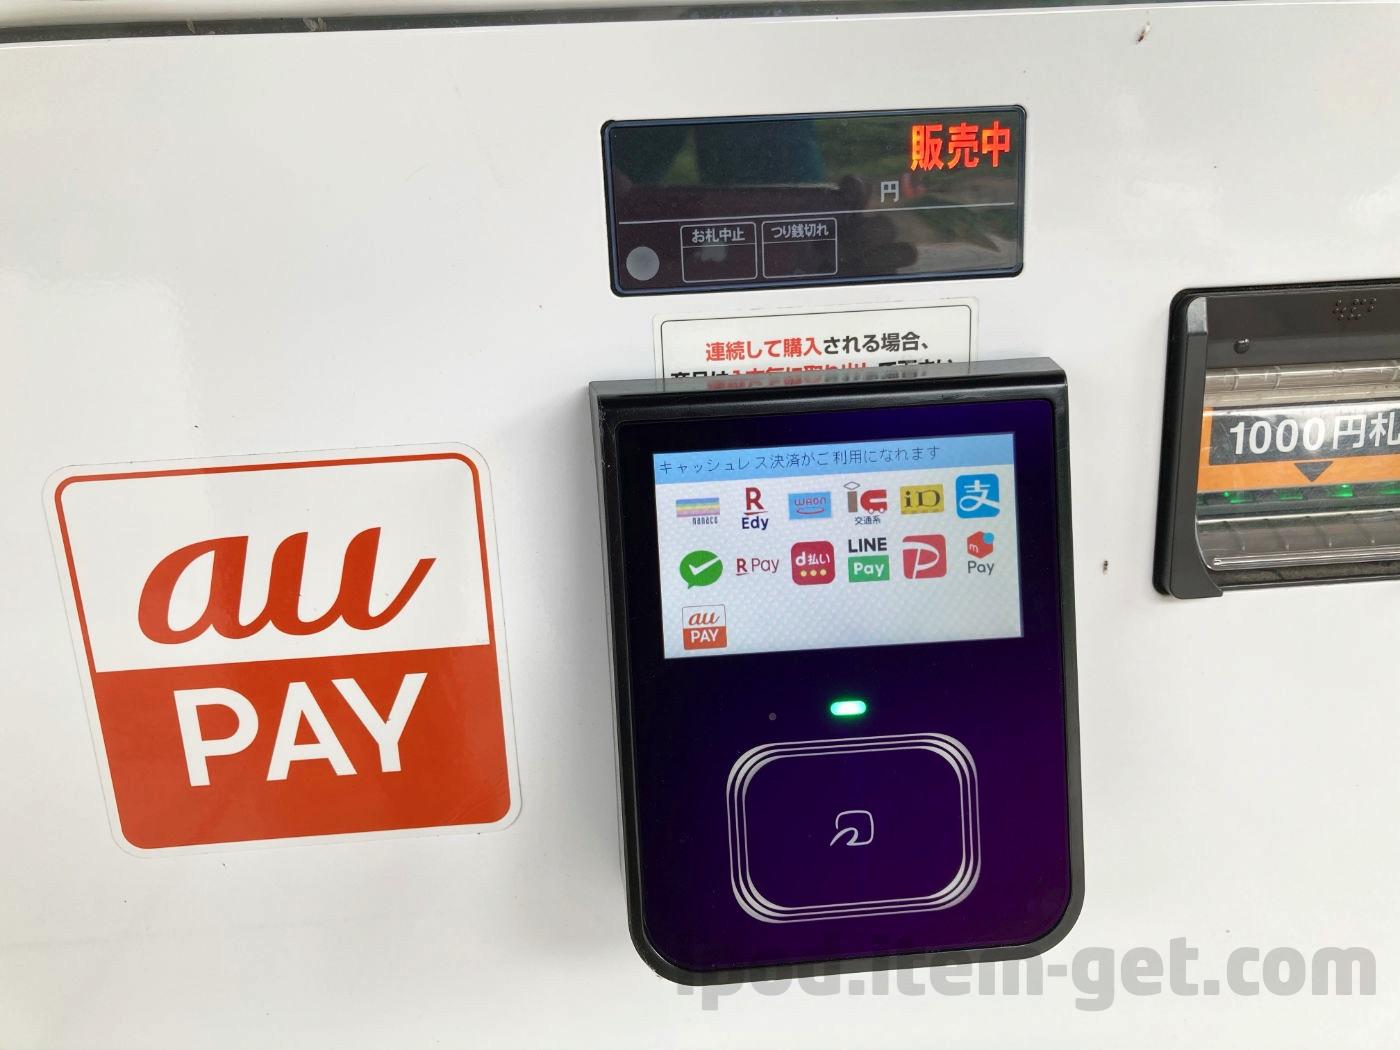 QRcode jihanki vendingmachine 02